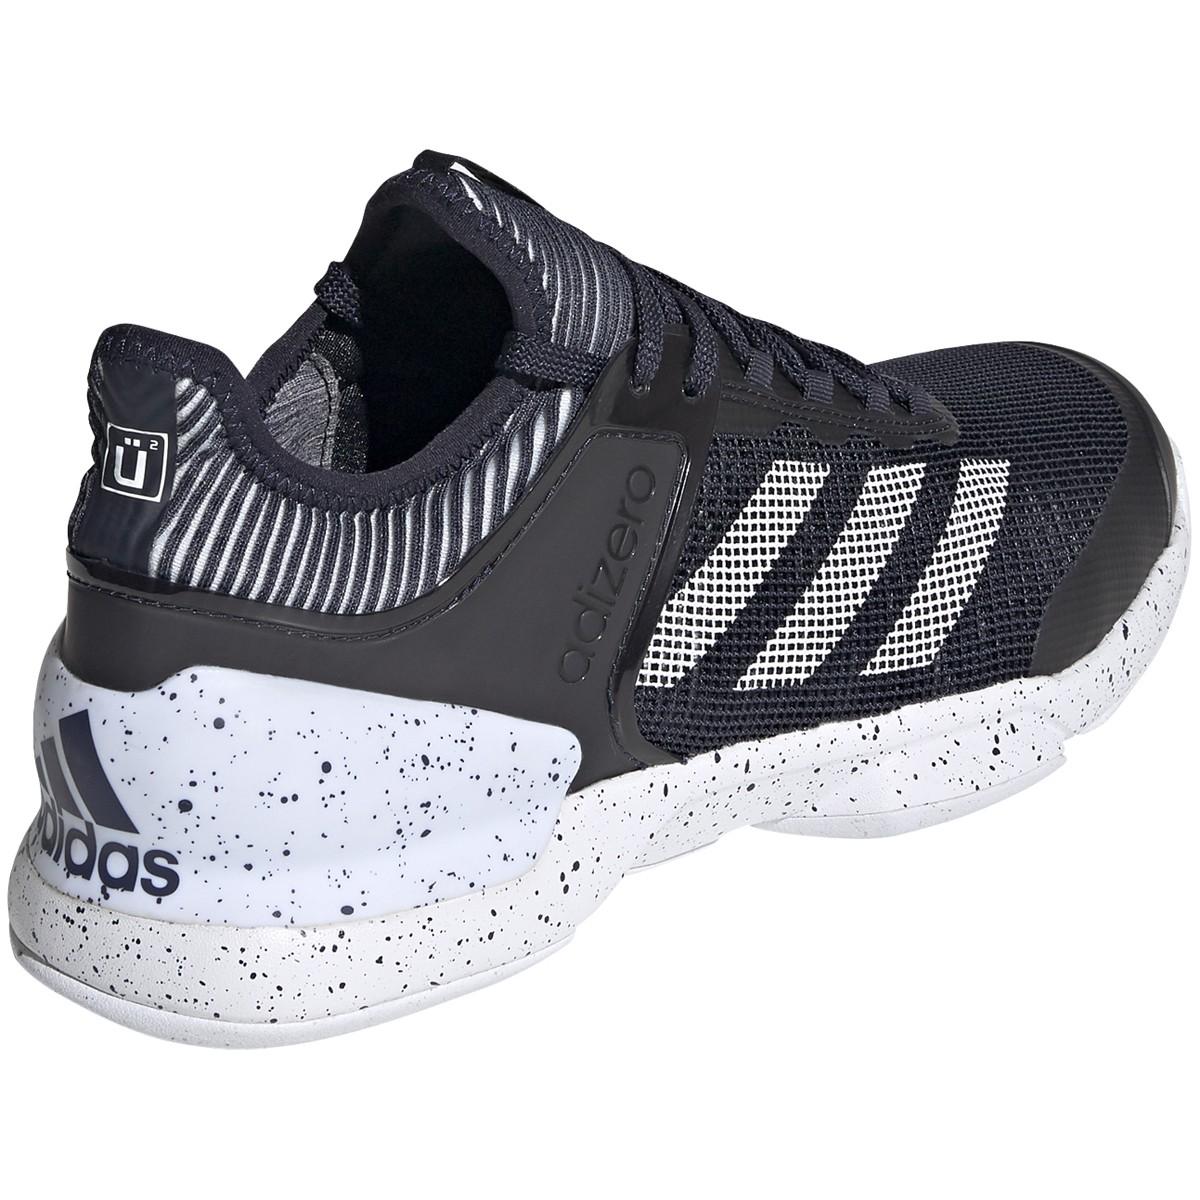 práctico Leonardoda Amplificar  ADIDAS ADIZERO UBERSONIC 2 ALL COURT SHOES - ADIDAS - Men's - Shoes |  Tennispro